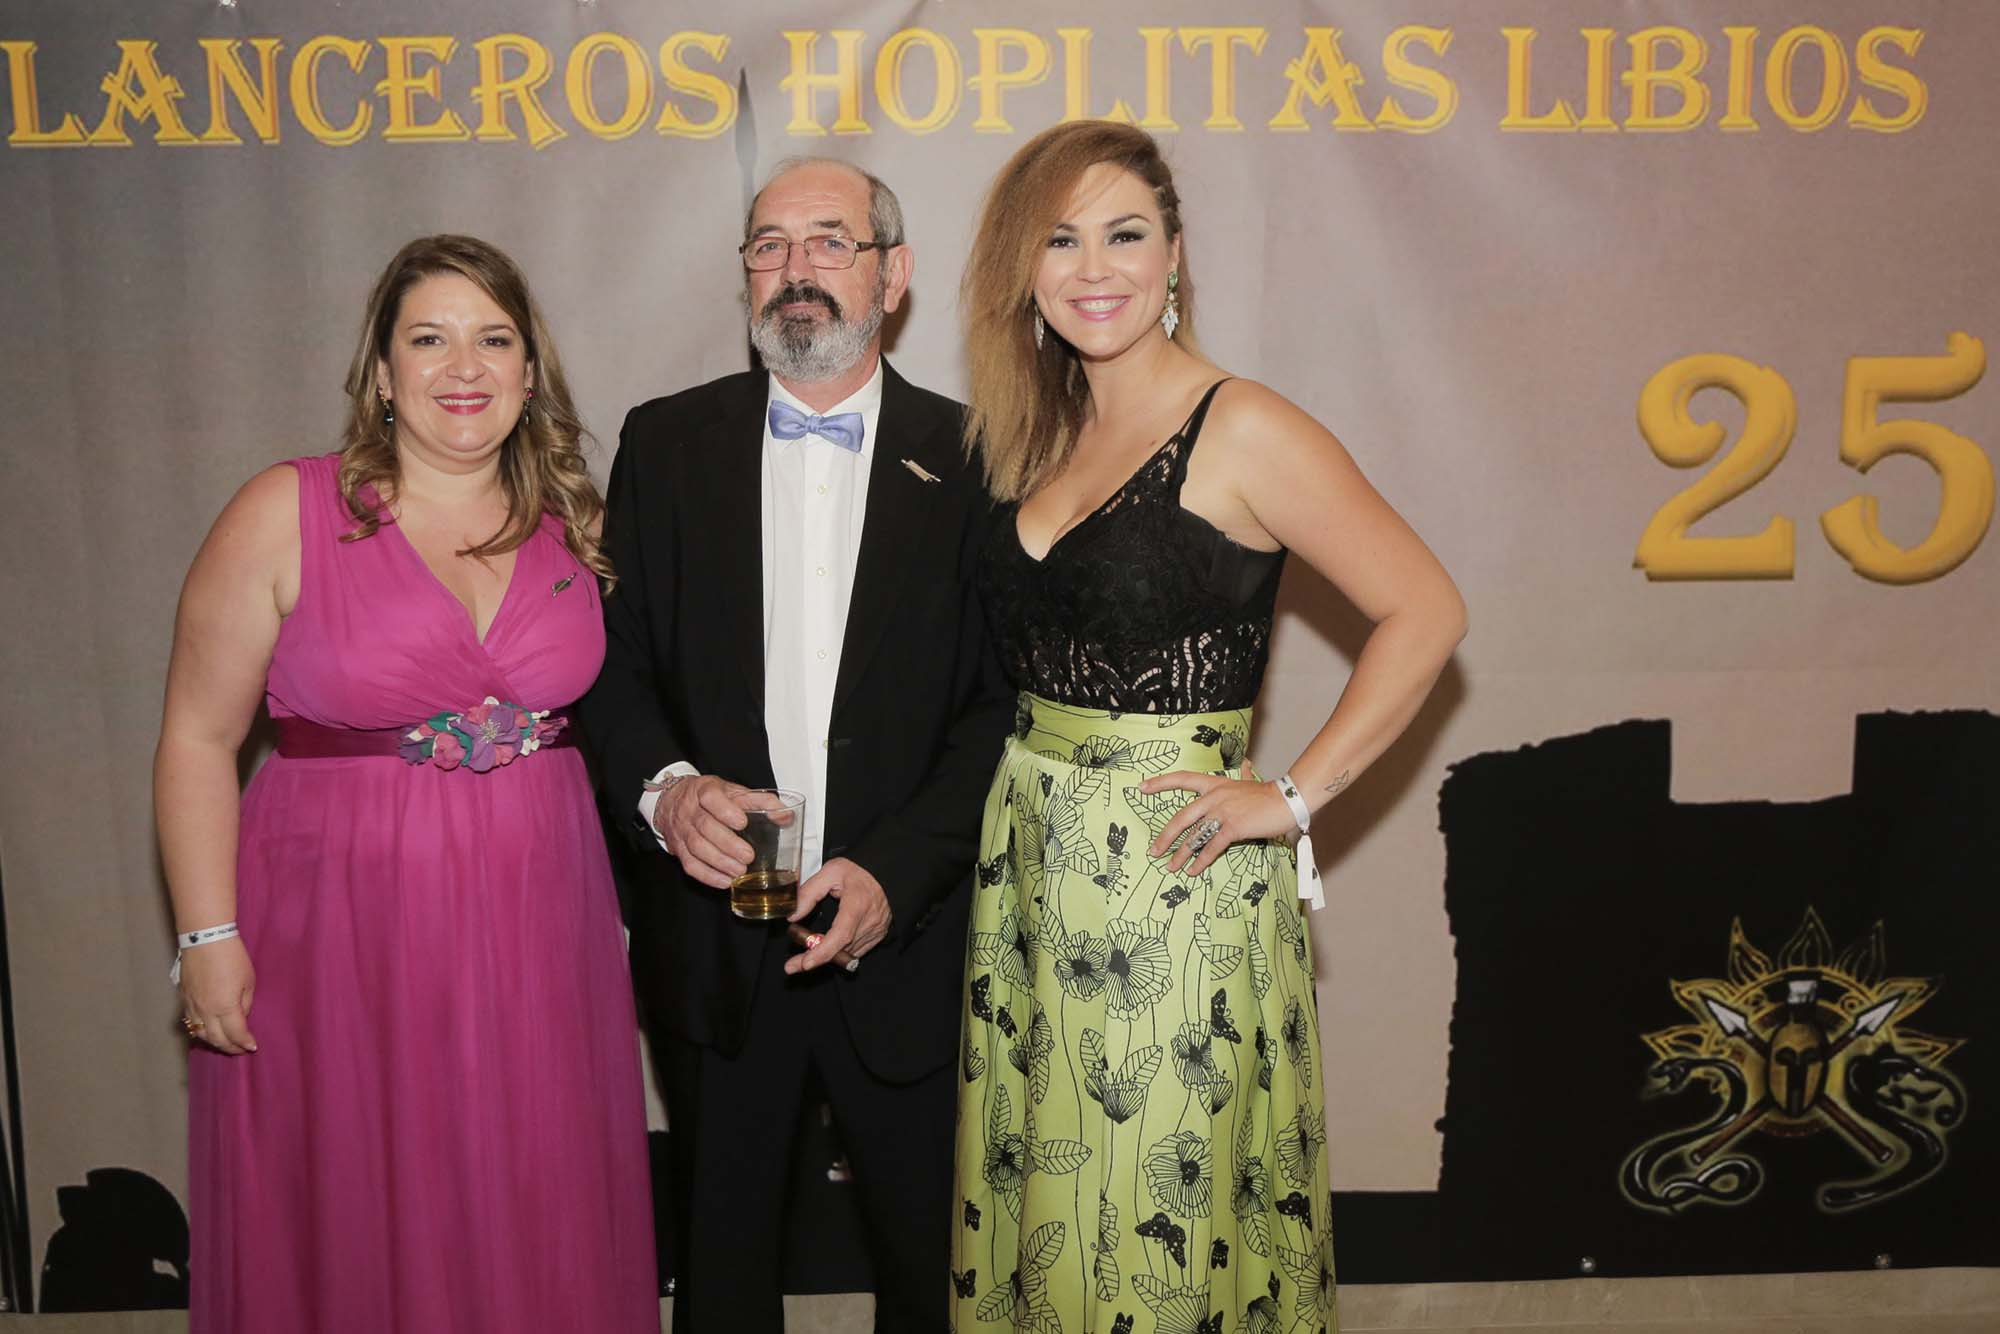 Lanceros Hoplitas Libios  (229)